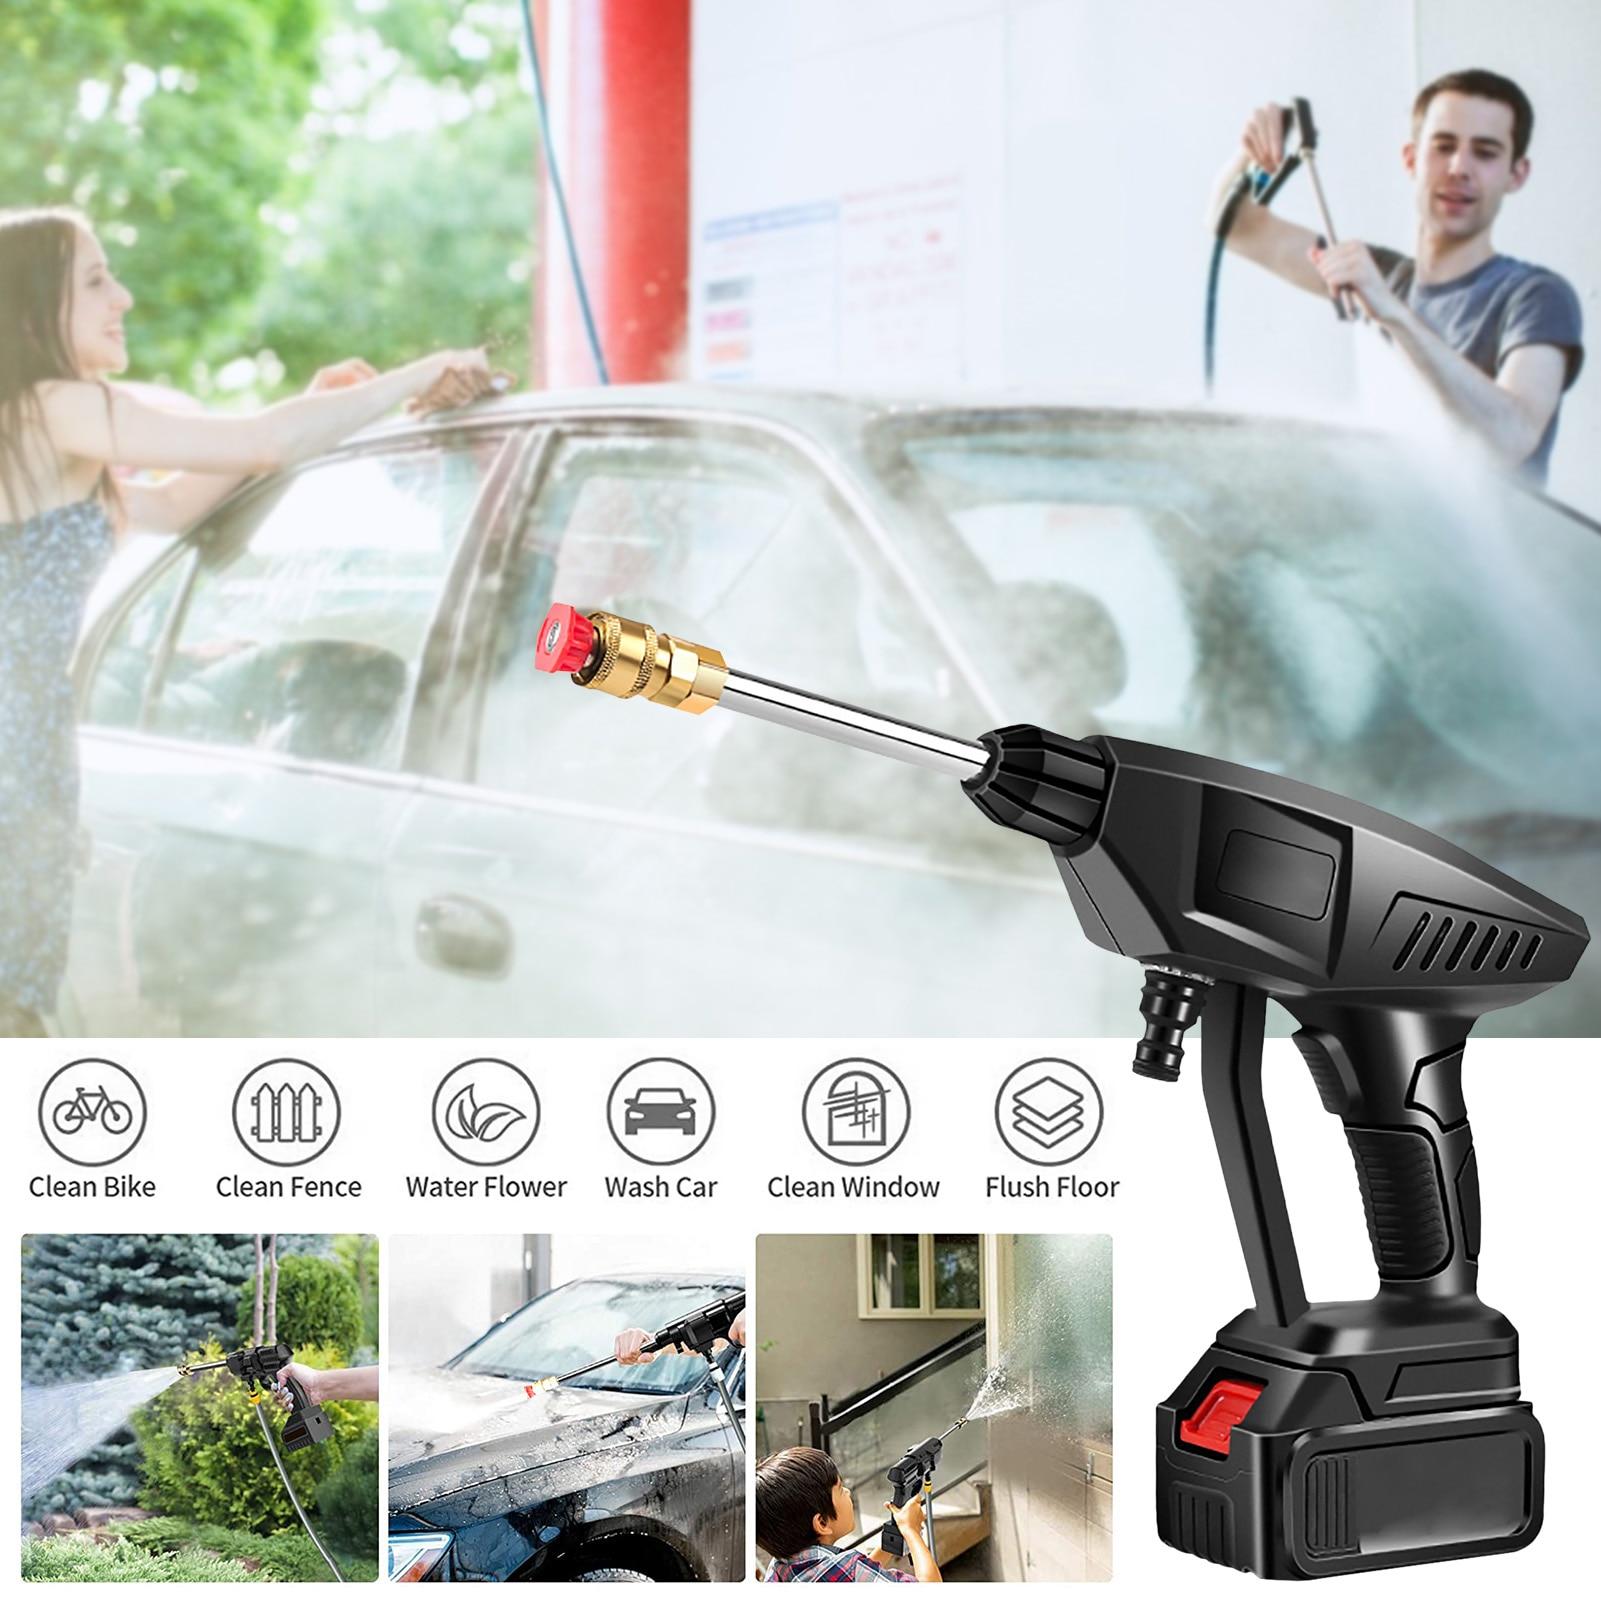 Cordless Pressure Washer Portable Multi-function Power Cleaner High Pressure Car Washer Car Wash Water Gun Garden Tool Hot Sale